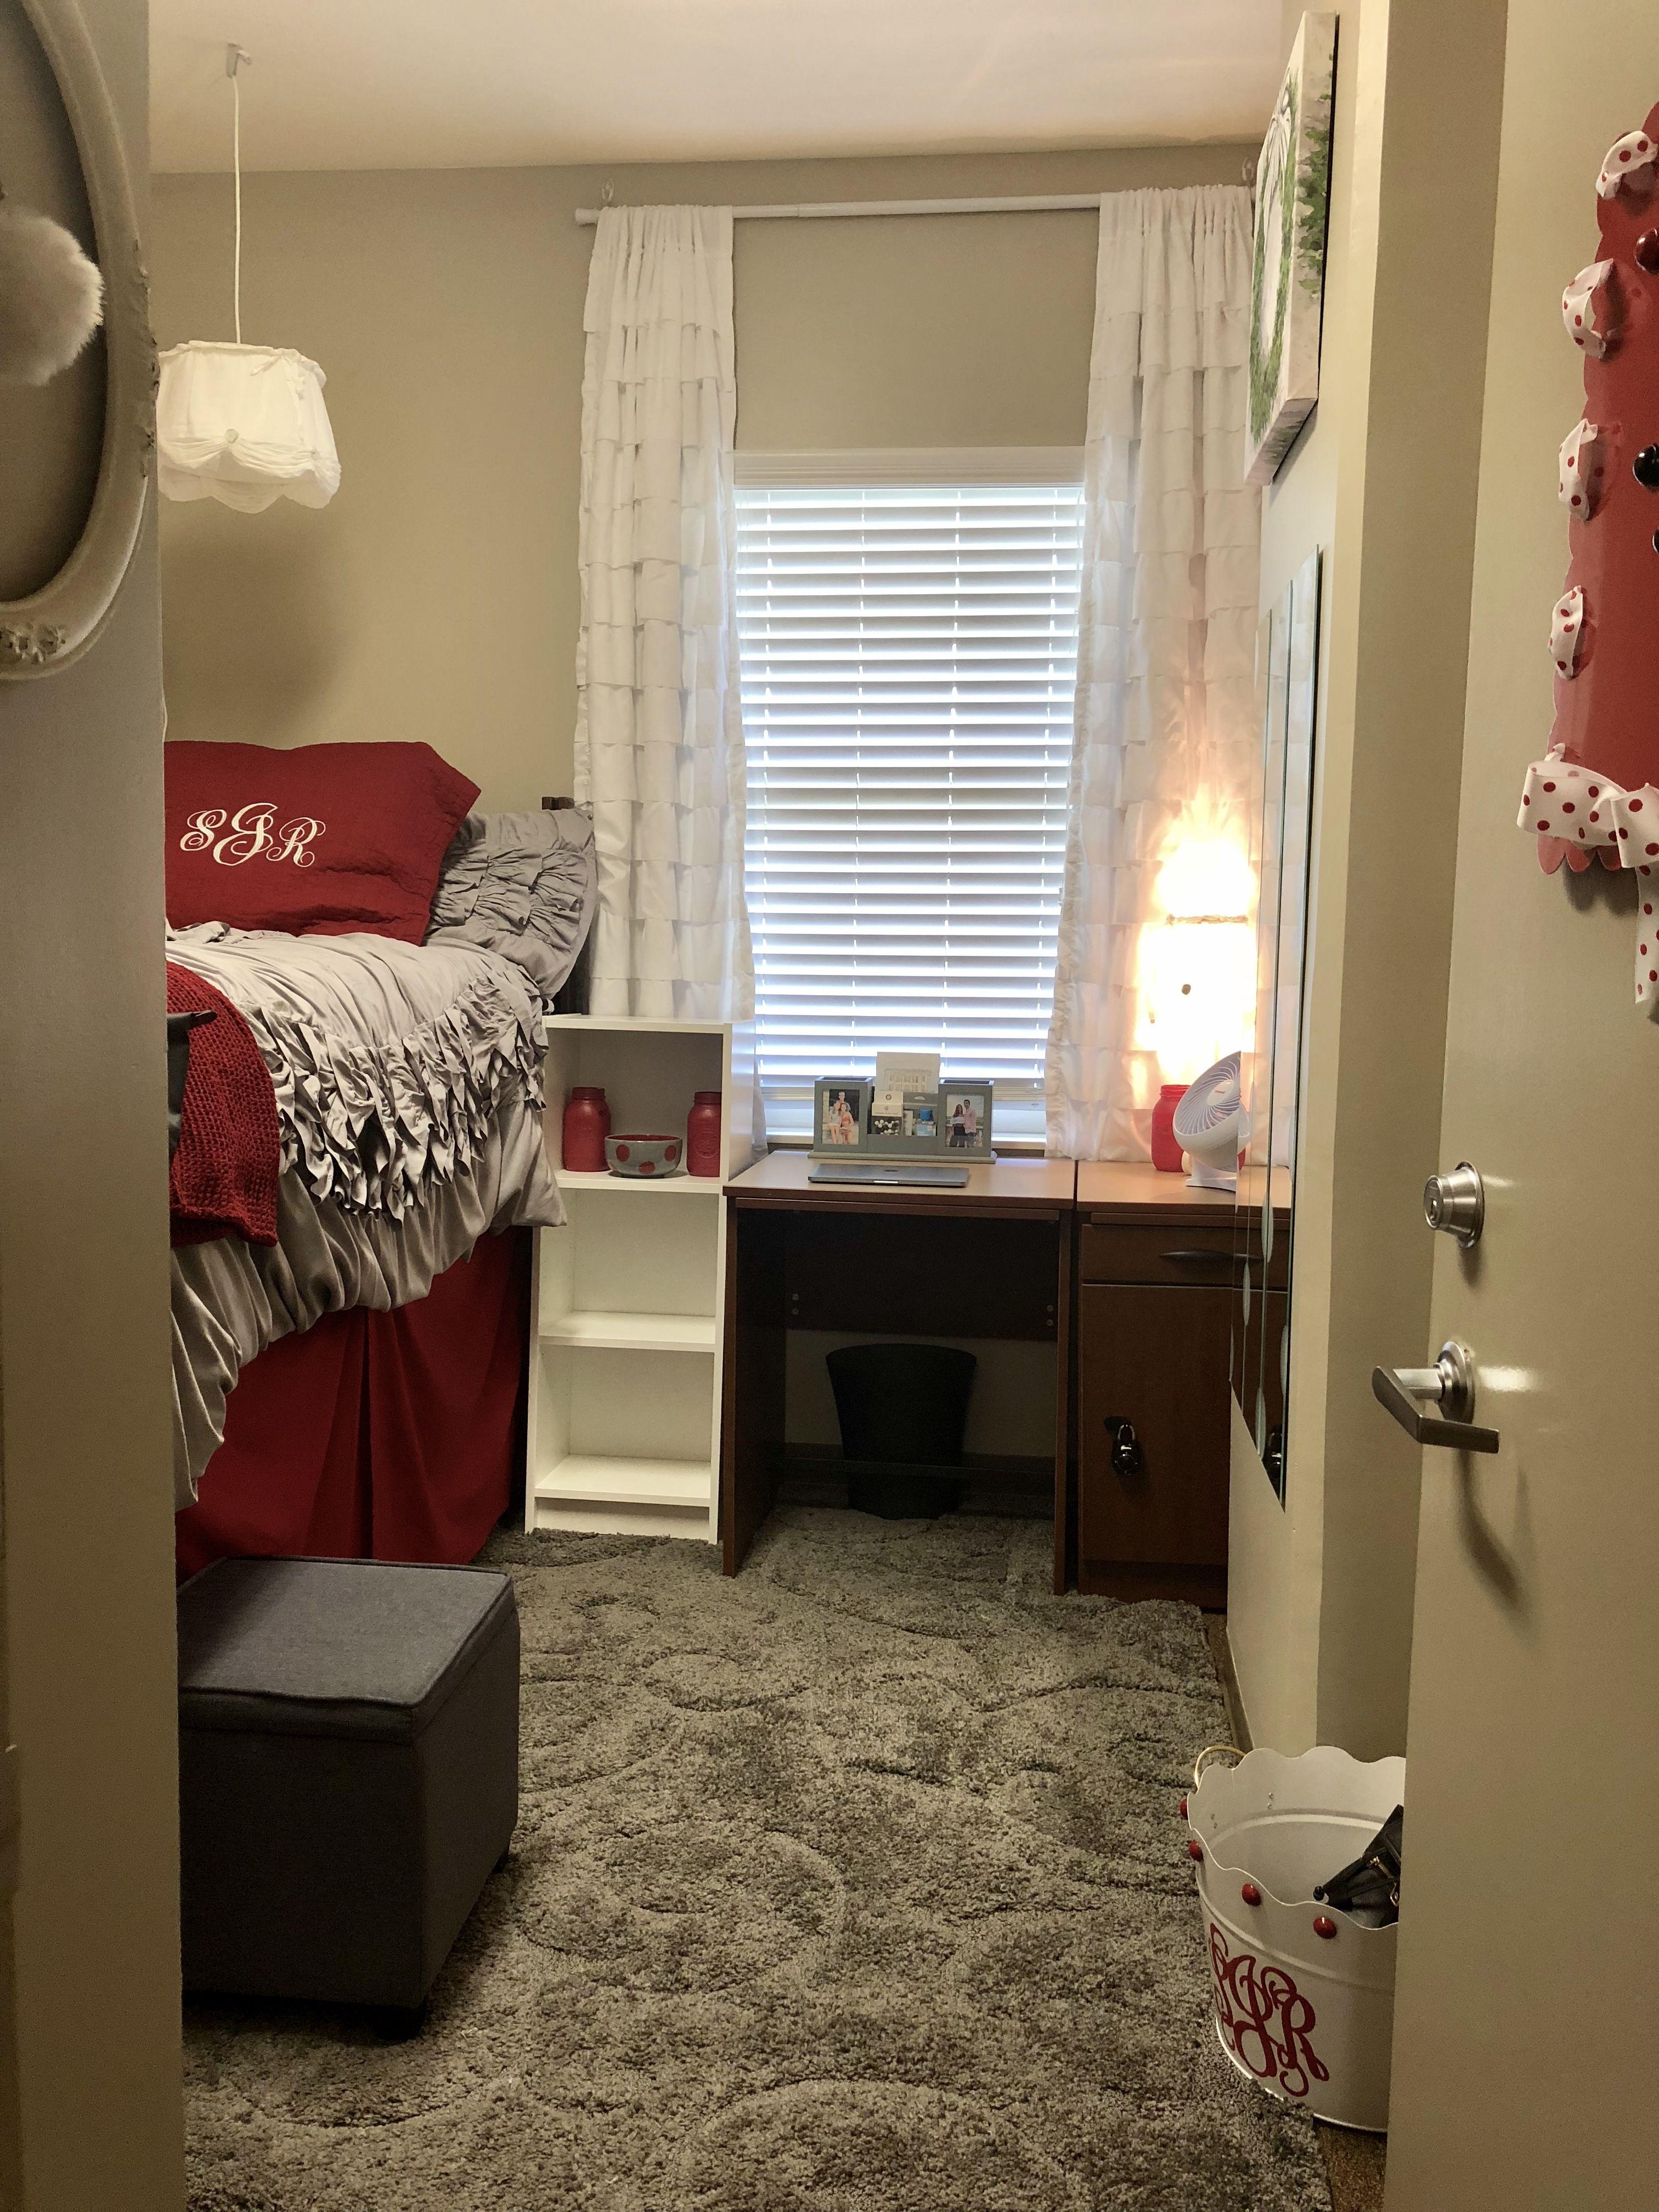 University Of Alabama Ridgecrest North Dorm Home Decor Dorm